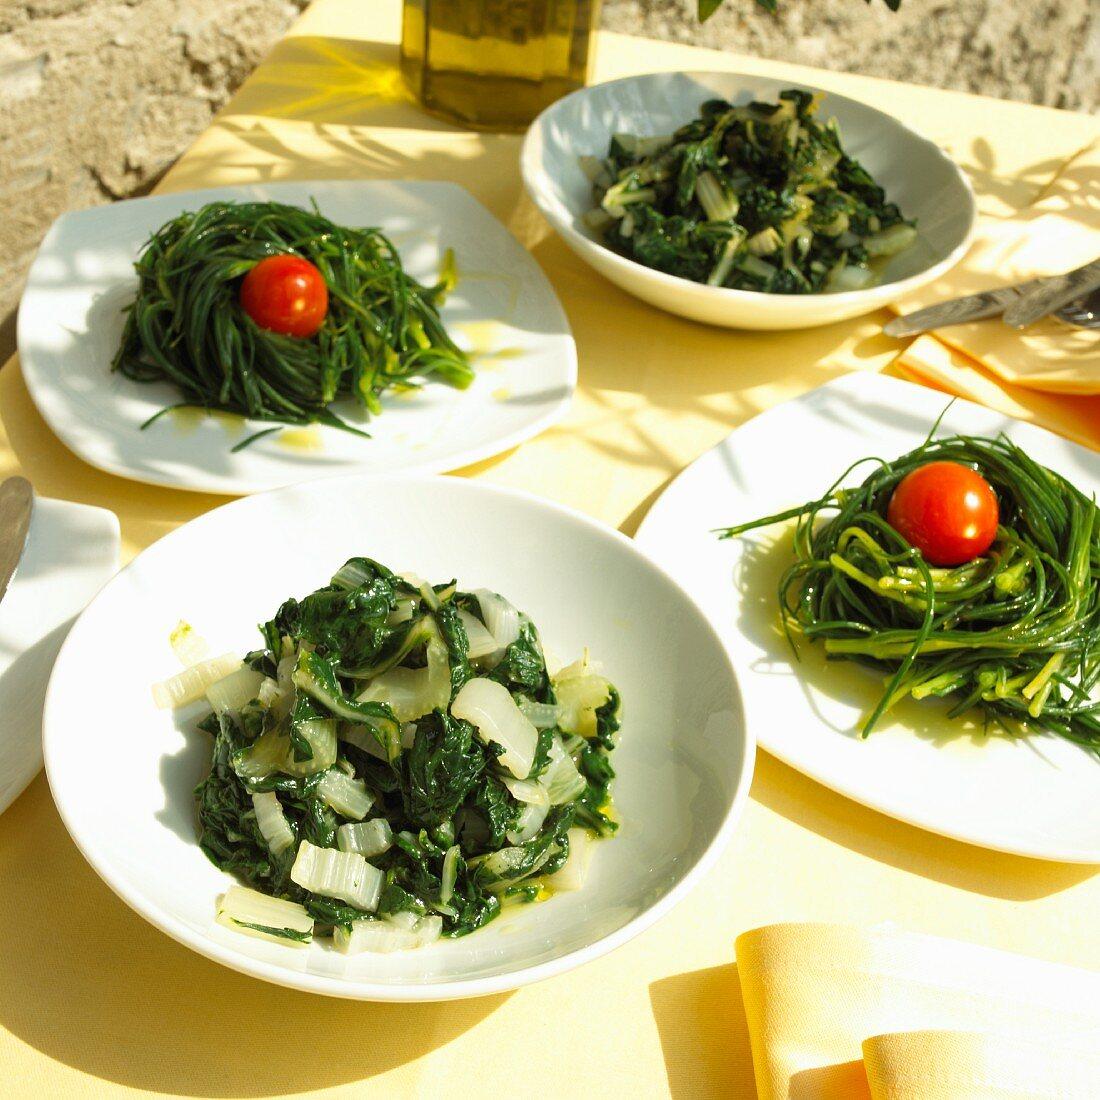 Verdure lesse (steamed vegetables, Italy)